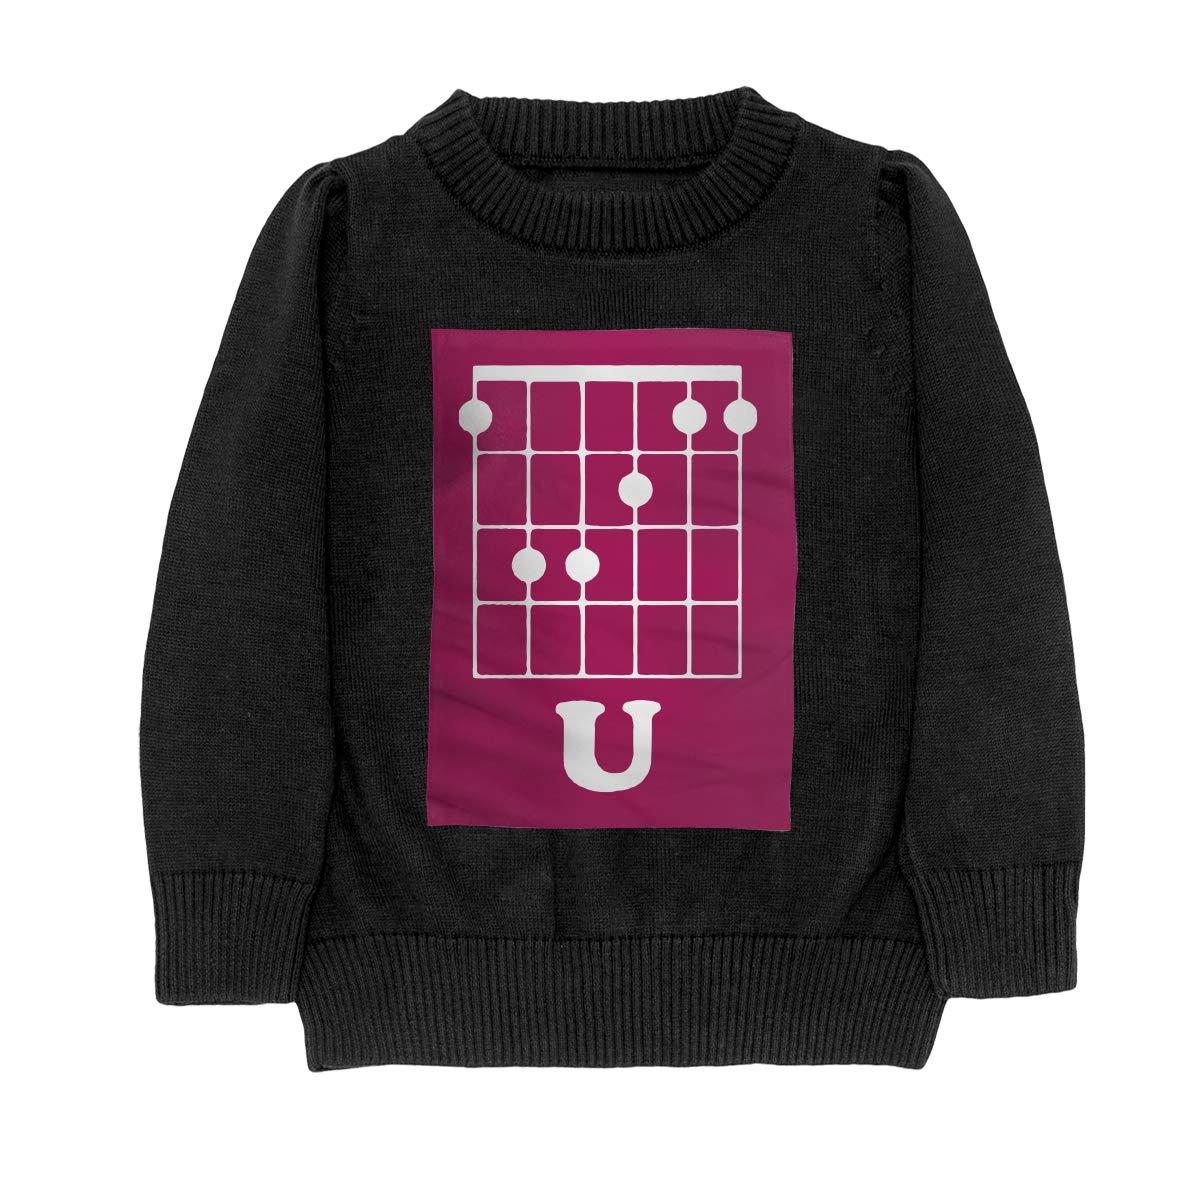 WWTBBJ-B Guitar F Chord Flat Bill Snapback Fashion Teenager Boys /& Girls Unisex Sweater Keep Warm